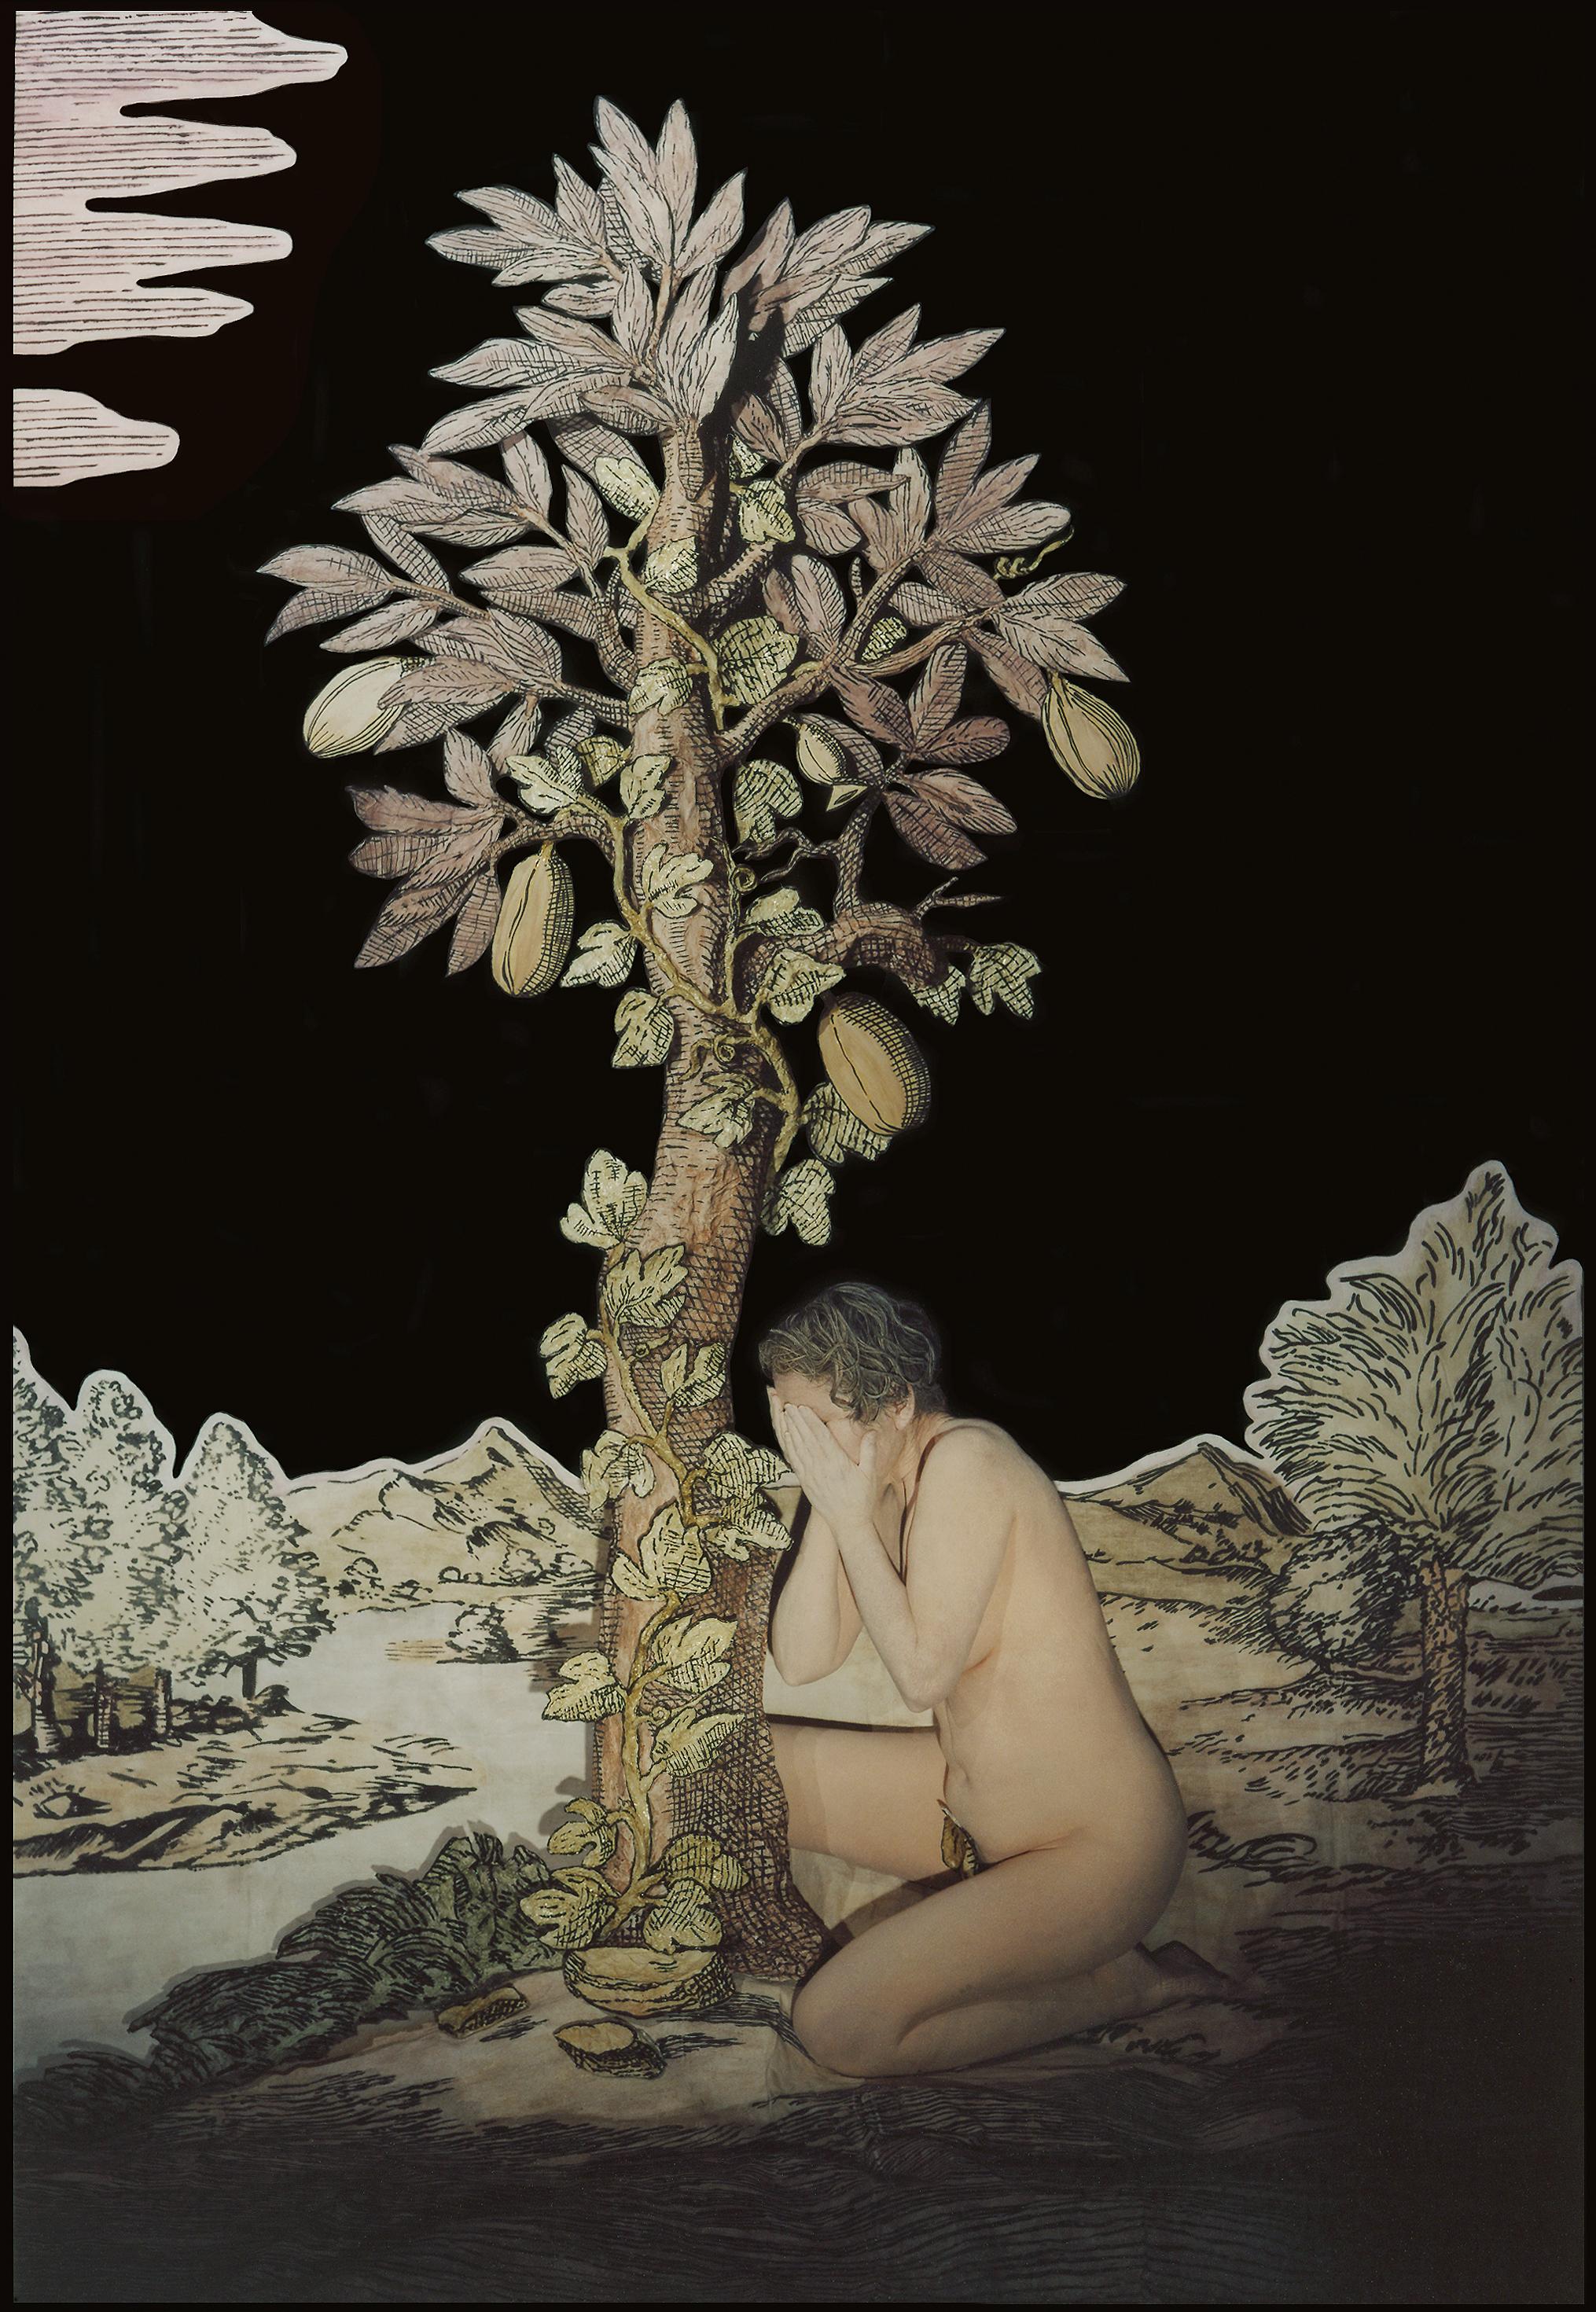 ROSE FARRELL & GEORGE PARKIN   Darkening Fields, Act Three  the series  Random Acts  2004/05 Type C Photograph 136 x 100 cm